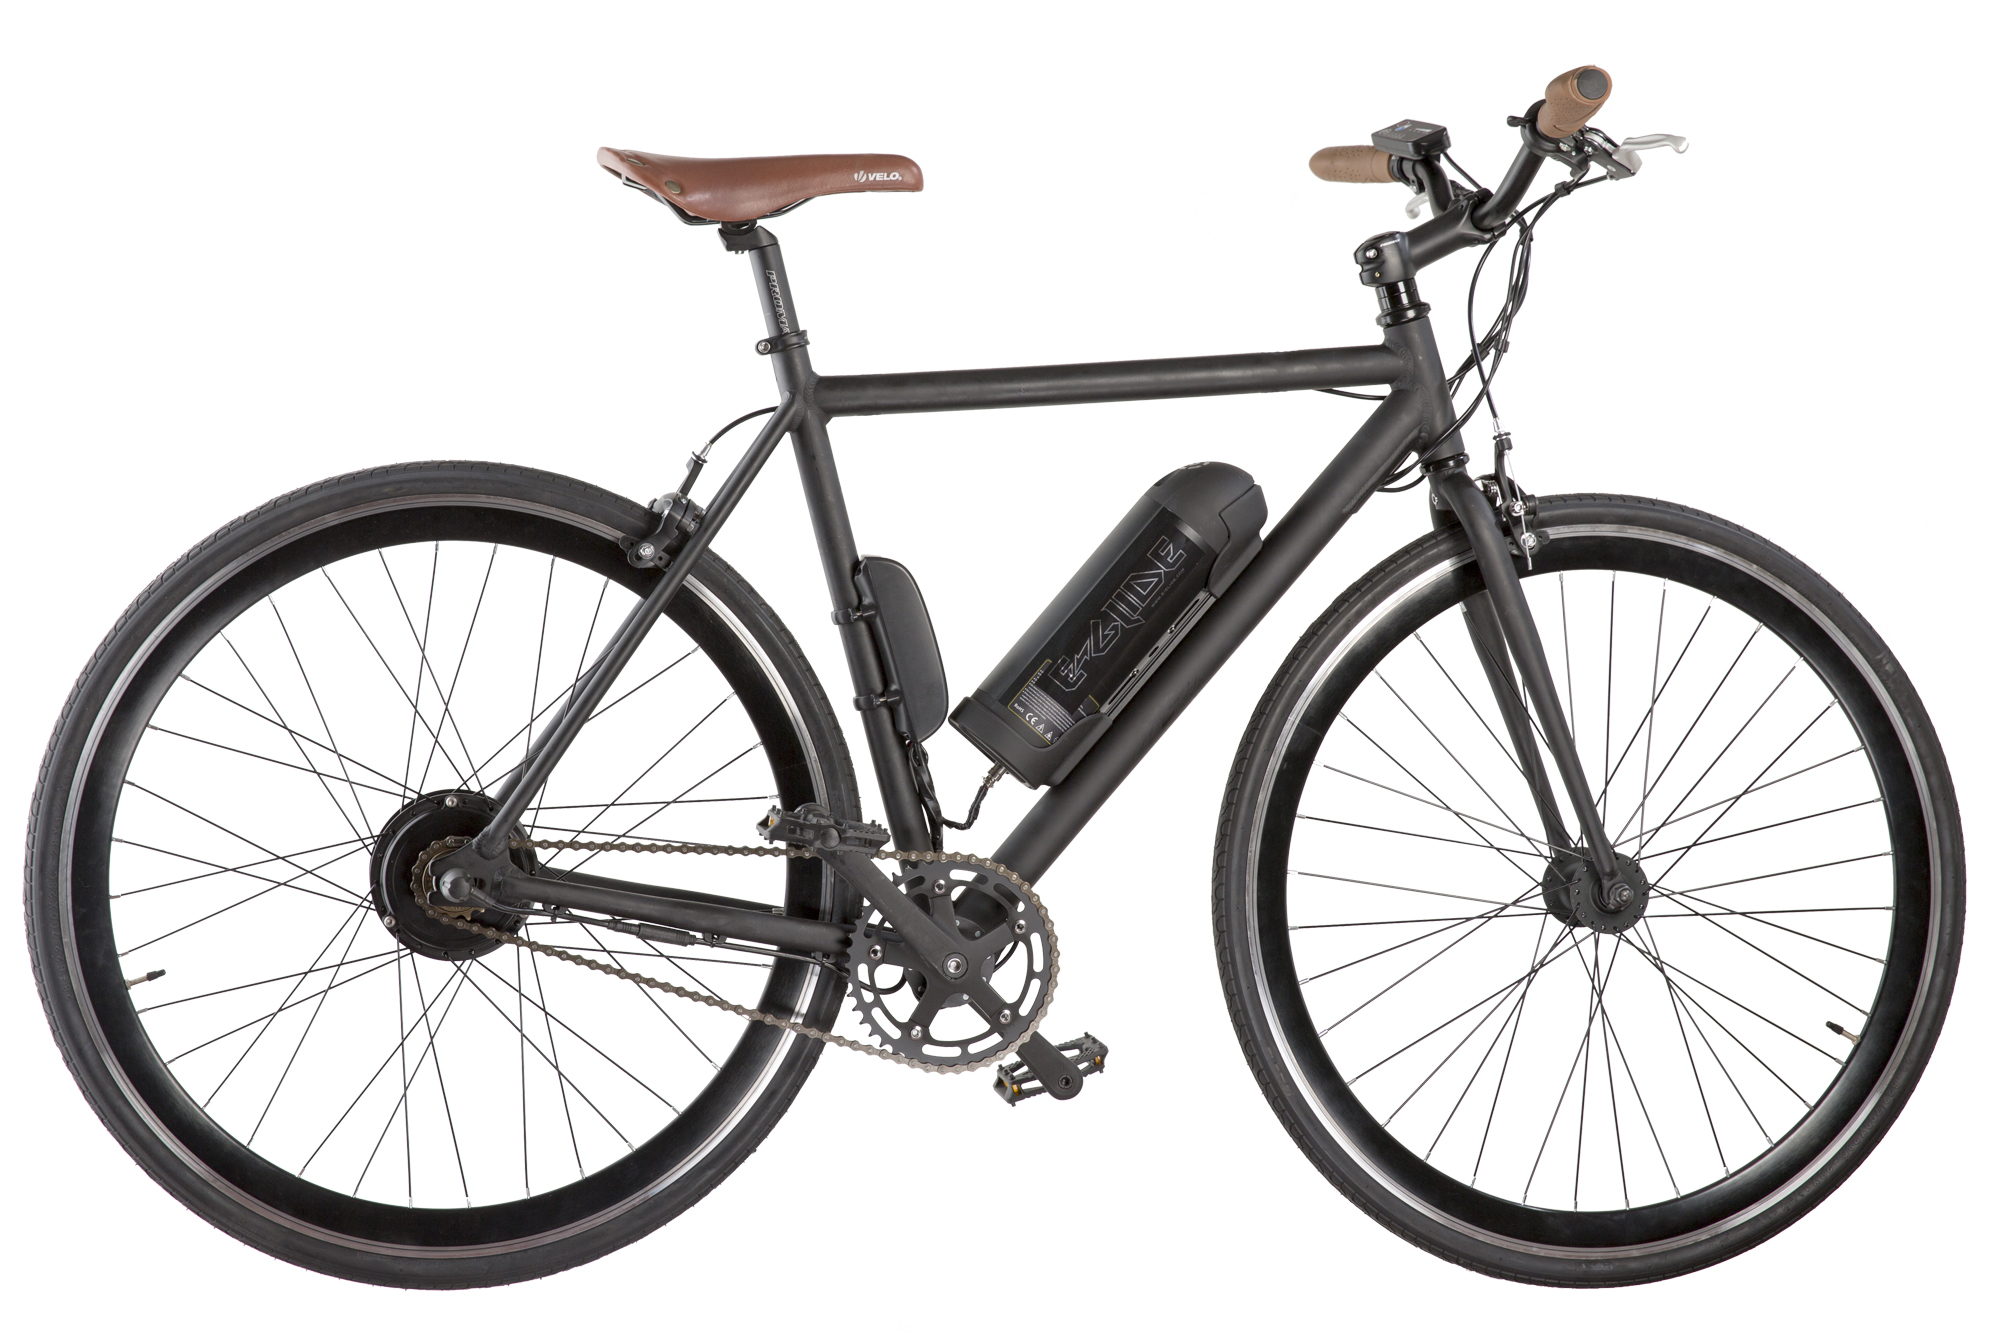 834a84b0fbb E-Glide, a Santa Monica Electric Bike and Powerboard Manufacturer ...